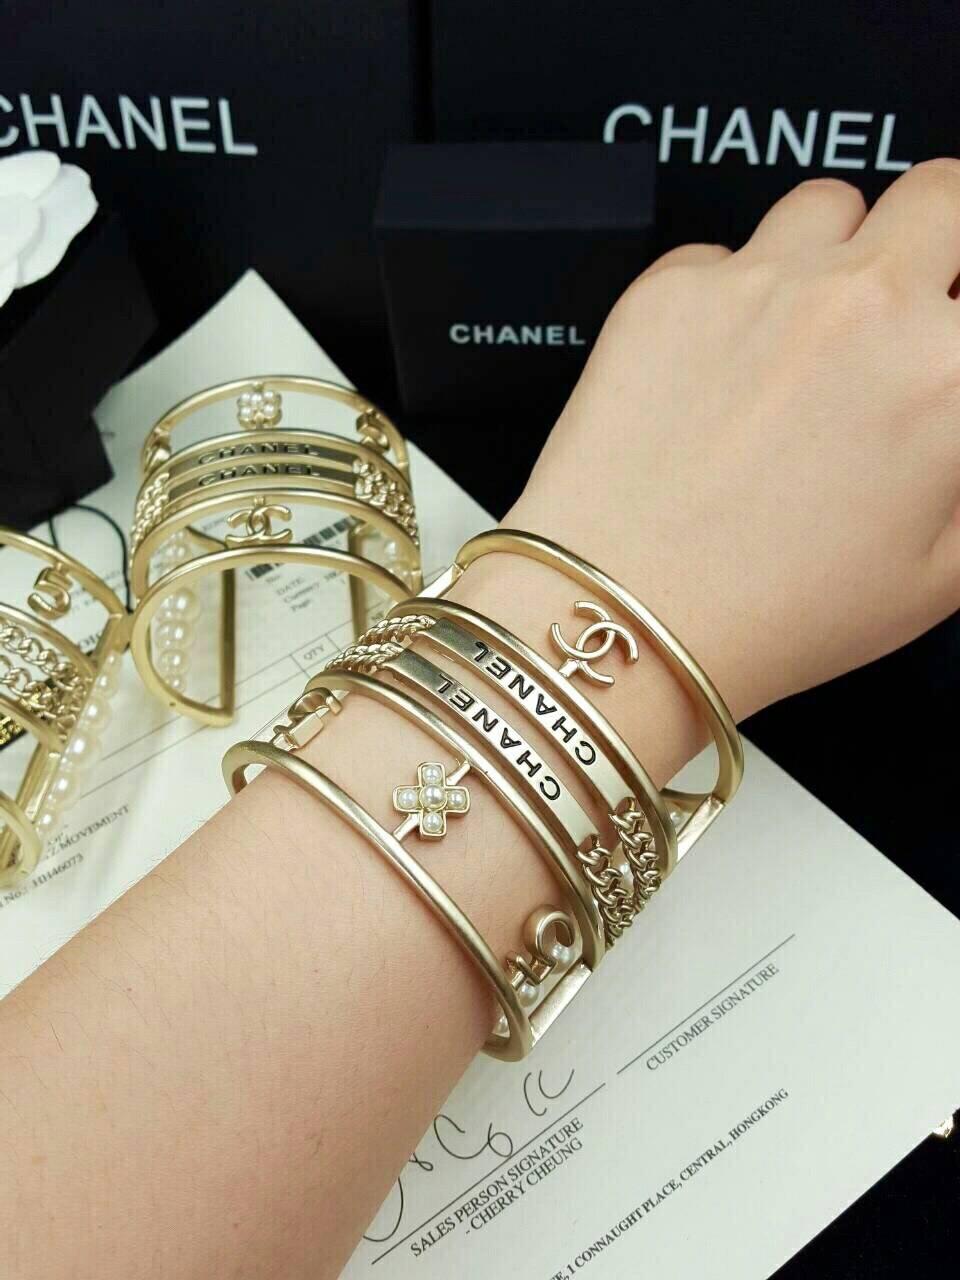 Chanel Bracelet งานซุปเปอร์ไฮเอนคะ สวยเหมือนทุกจุด ตัวเรือนหนาแข็งแรง